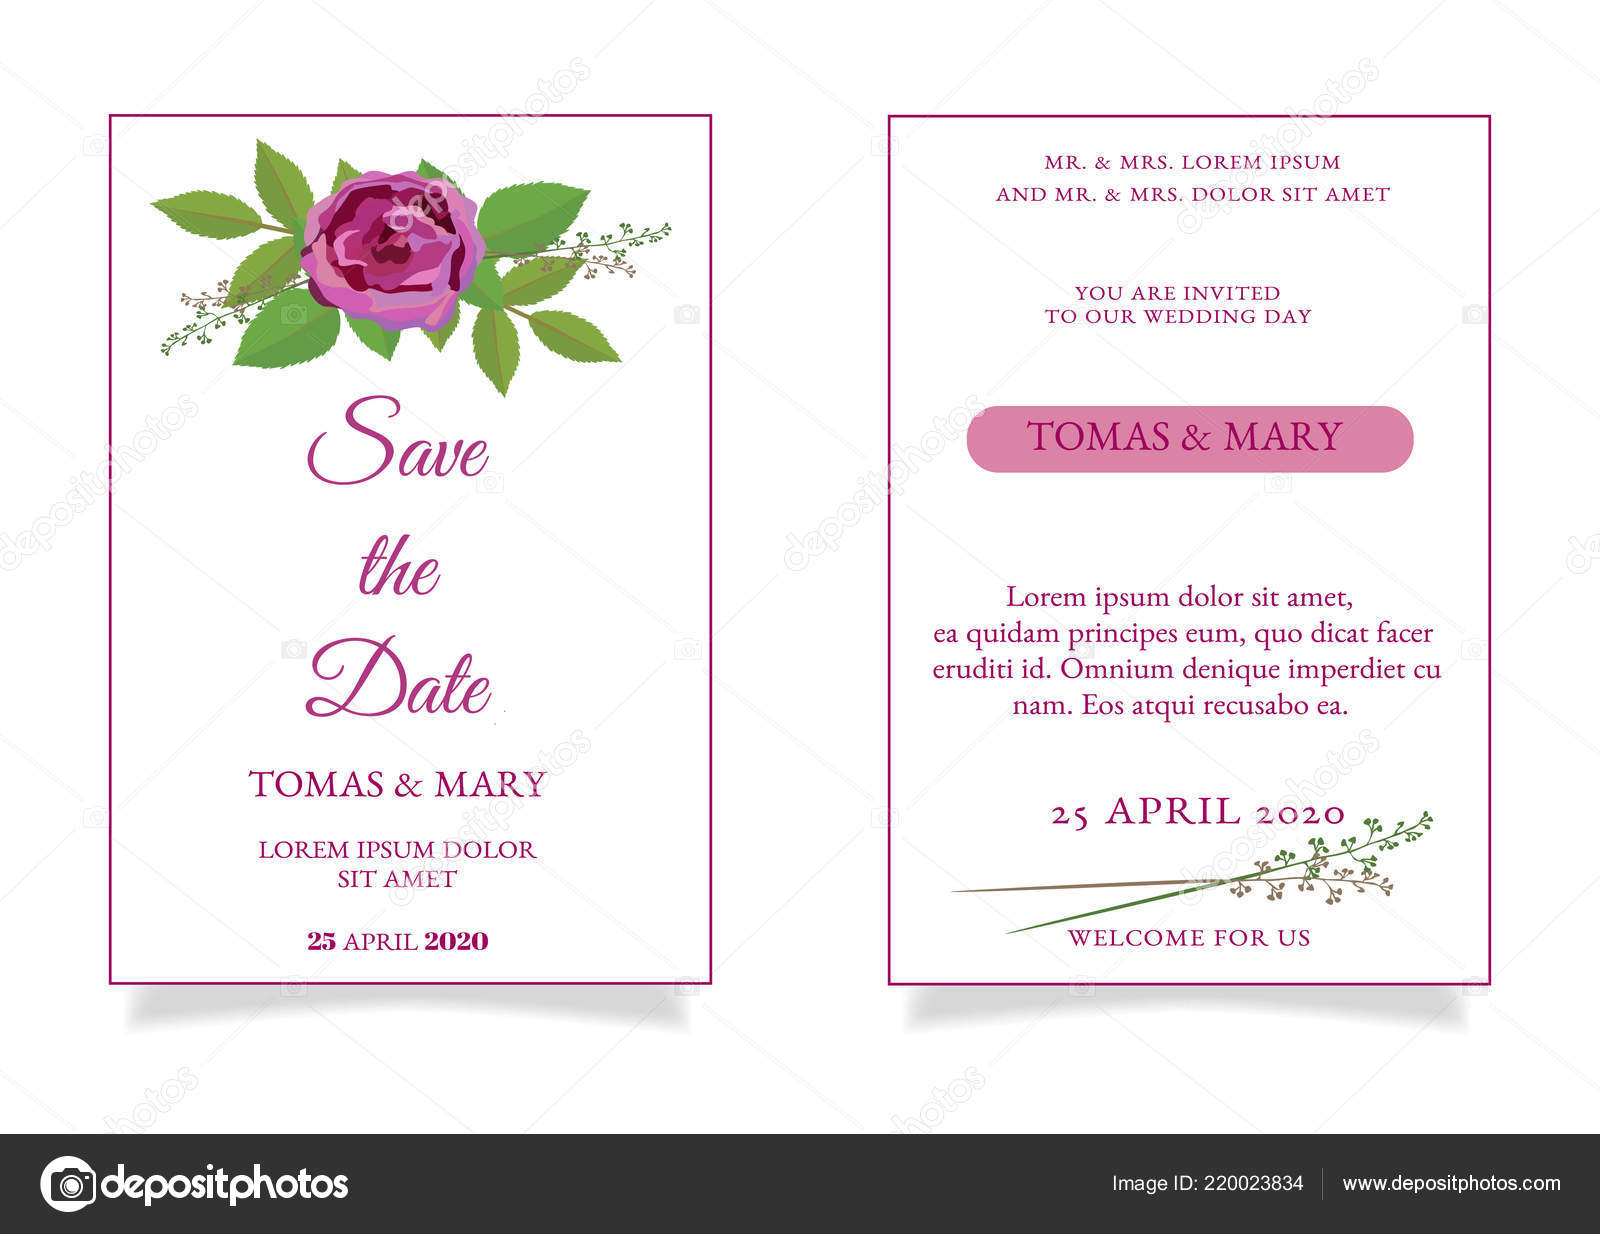 Modele Invitation Mariage Rustique Avec Rose Feuilles